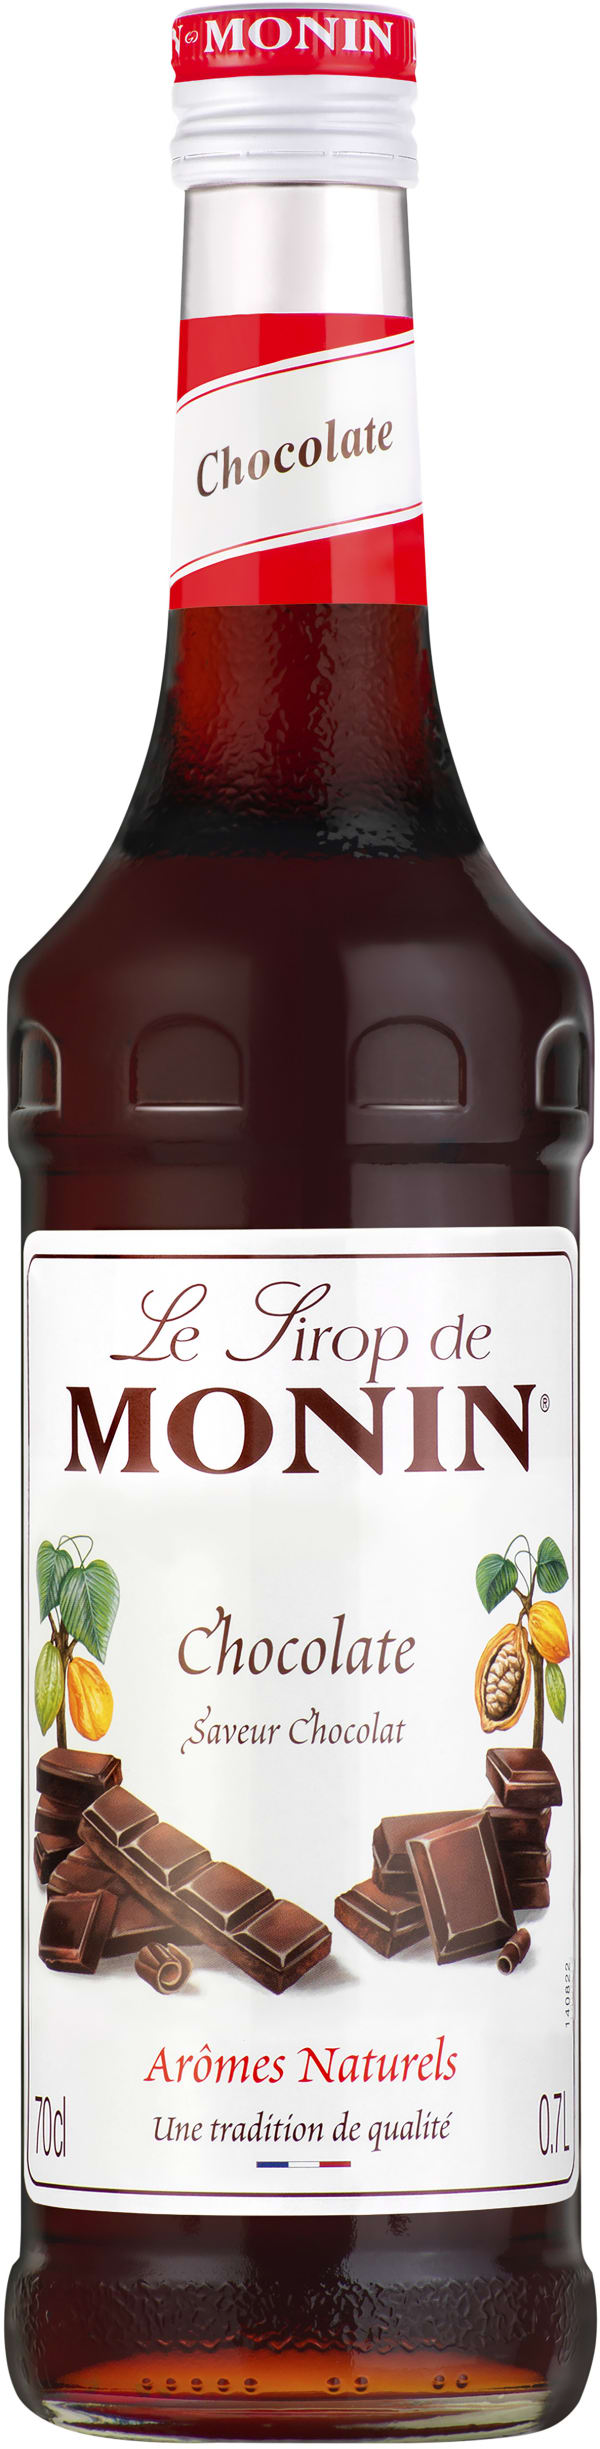 Le Sirop de Monin Chocolate